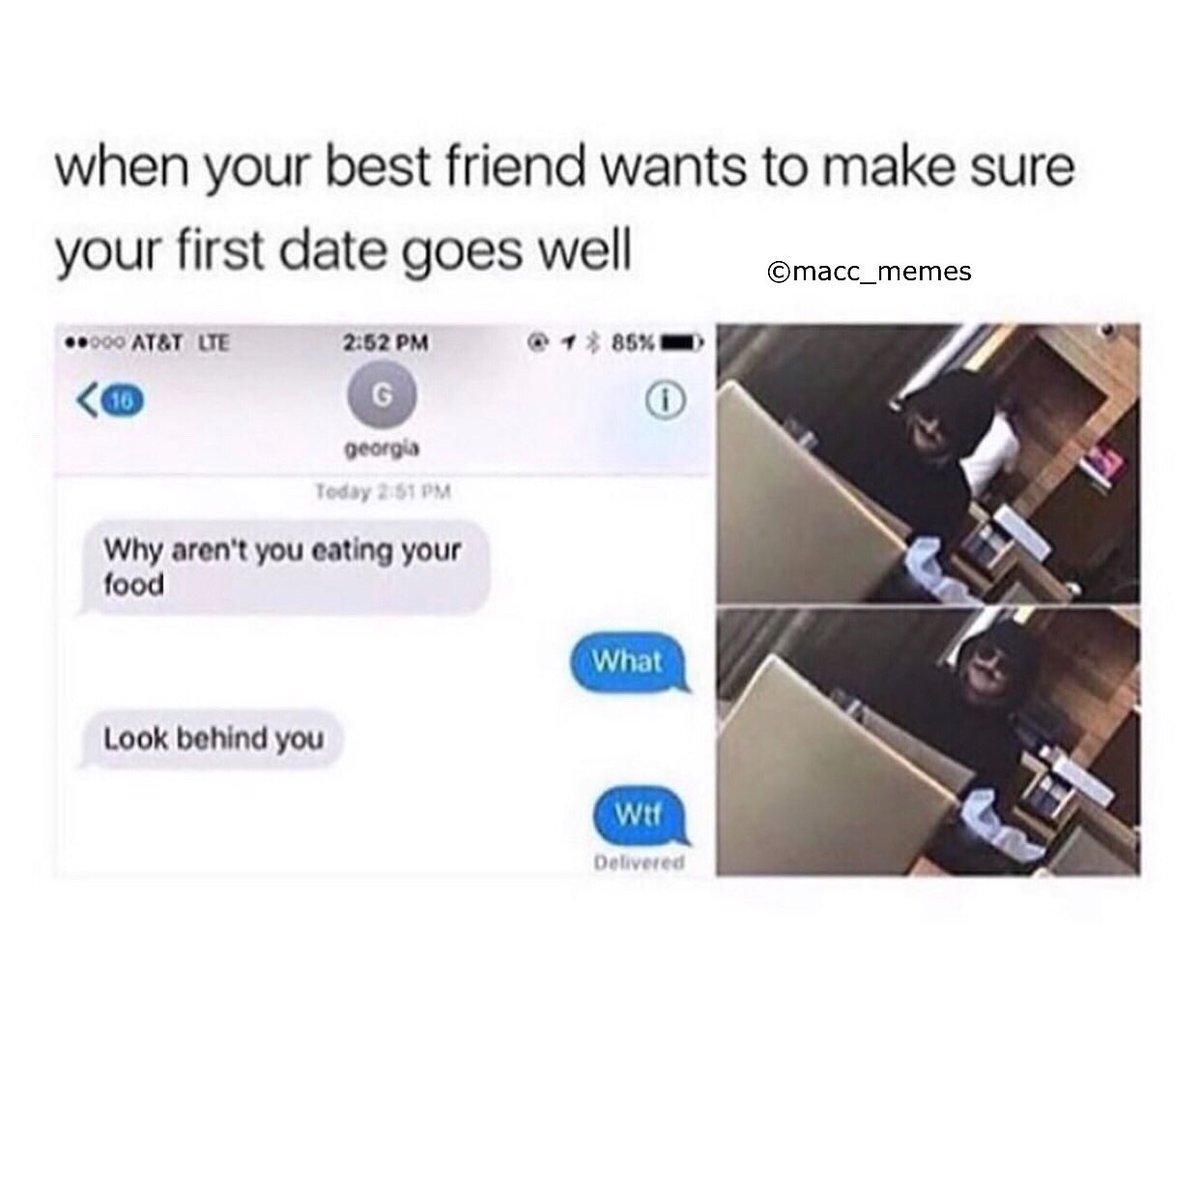 #discoverpage #meme #happynewyear #funnymemes #funny #hilariousmemes #relationshipgoals #drake #beyonce #yg #nickiminaj #cardib #hilariousmemes #facts #chrisbrown #BlackTwitterMovement #KanyeWest #GRAMMYs #MeekMill